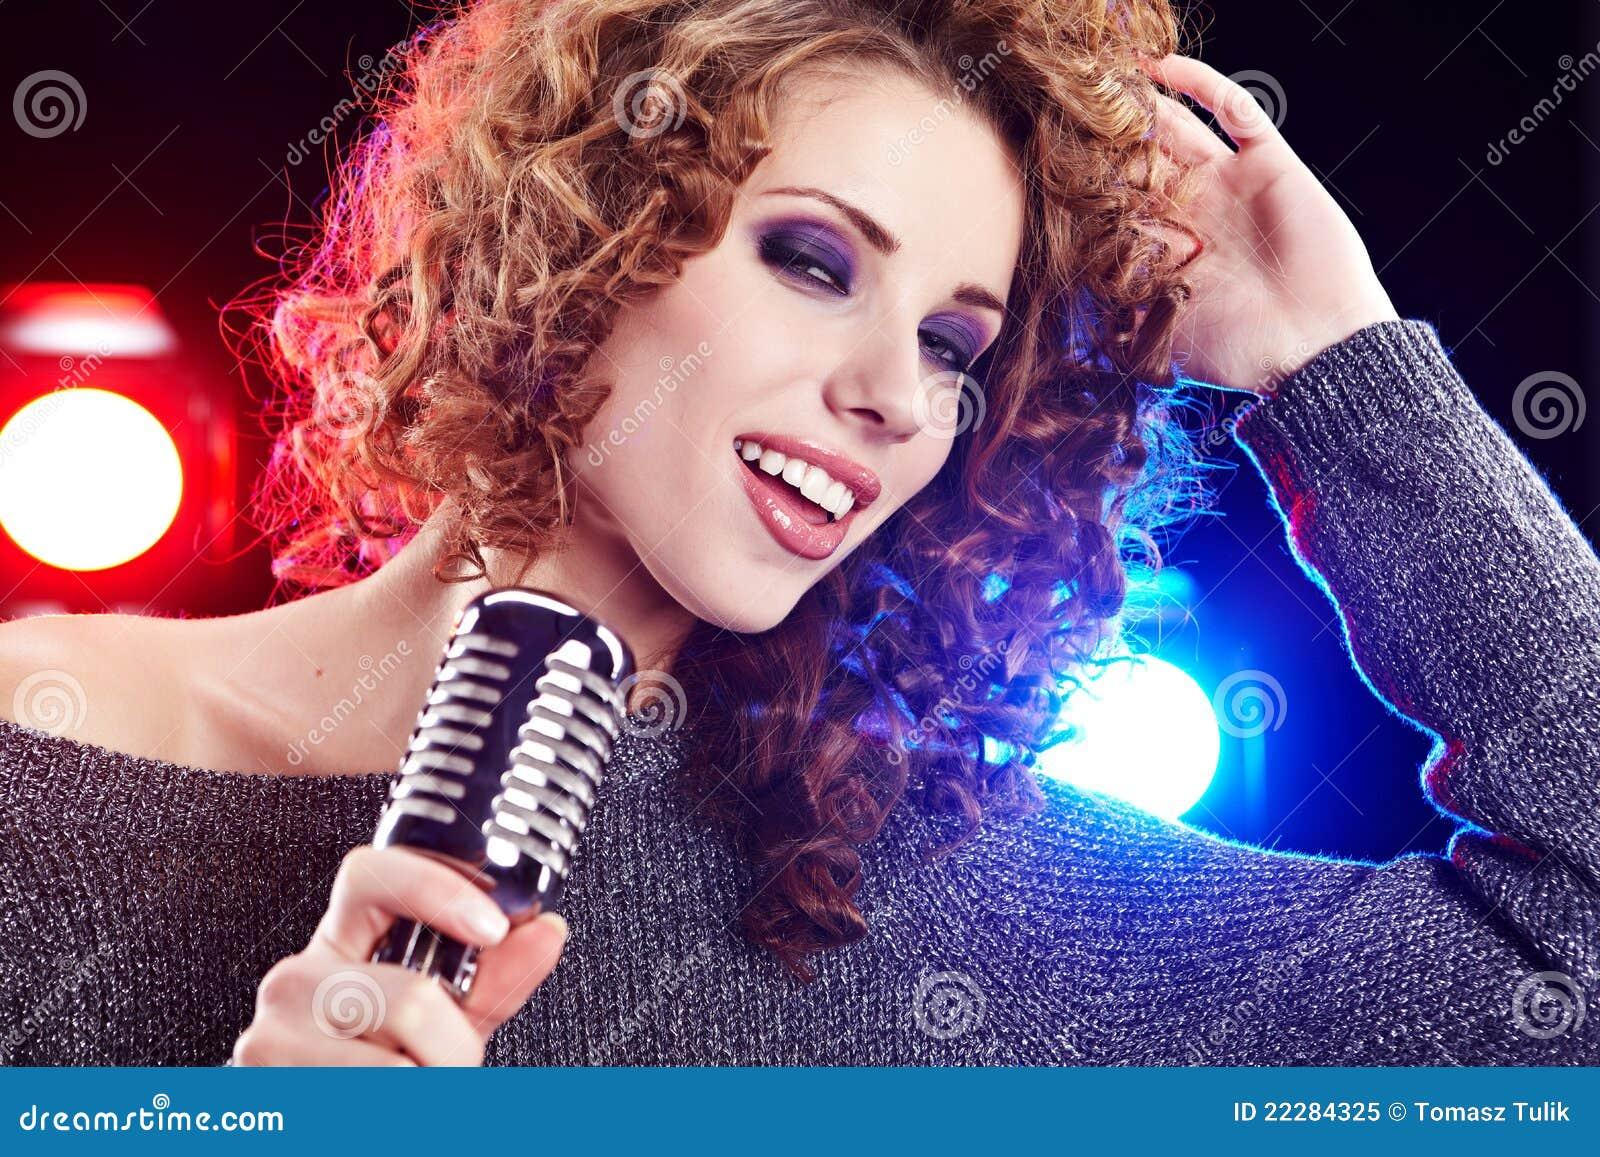 singing the girl retro - photo #47